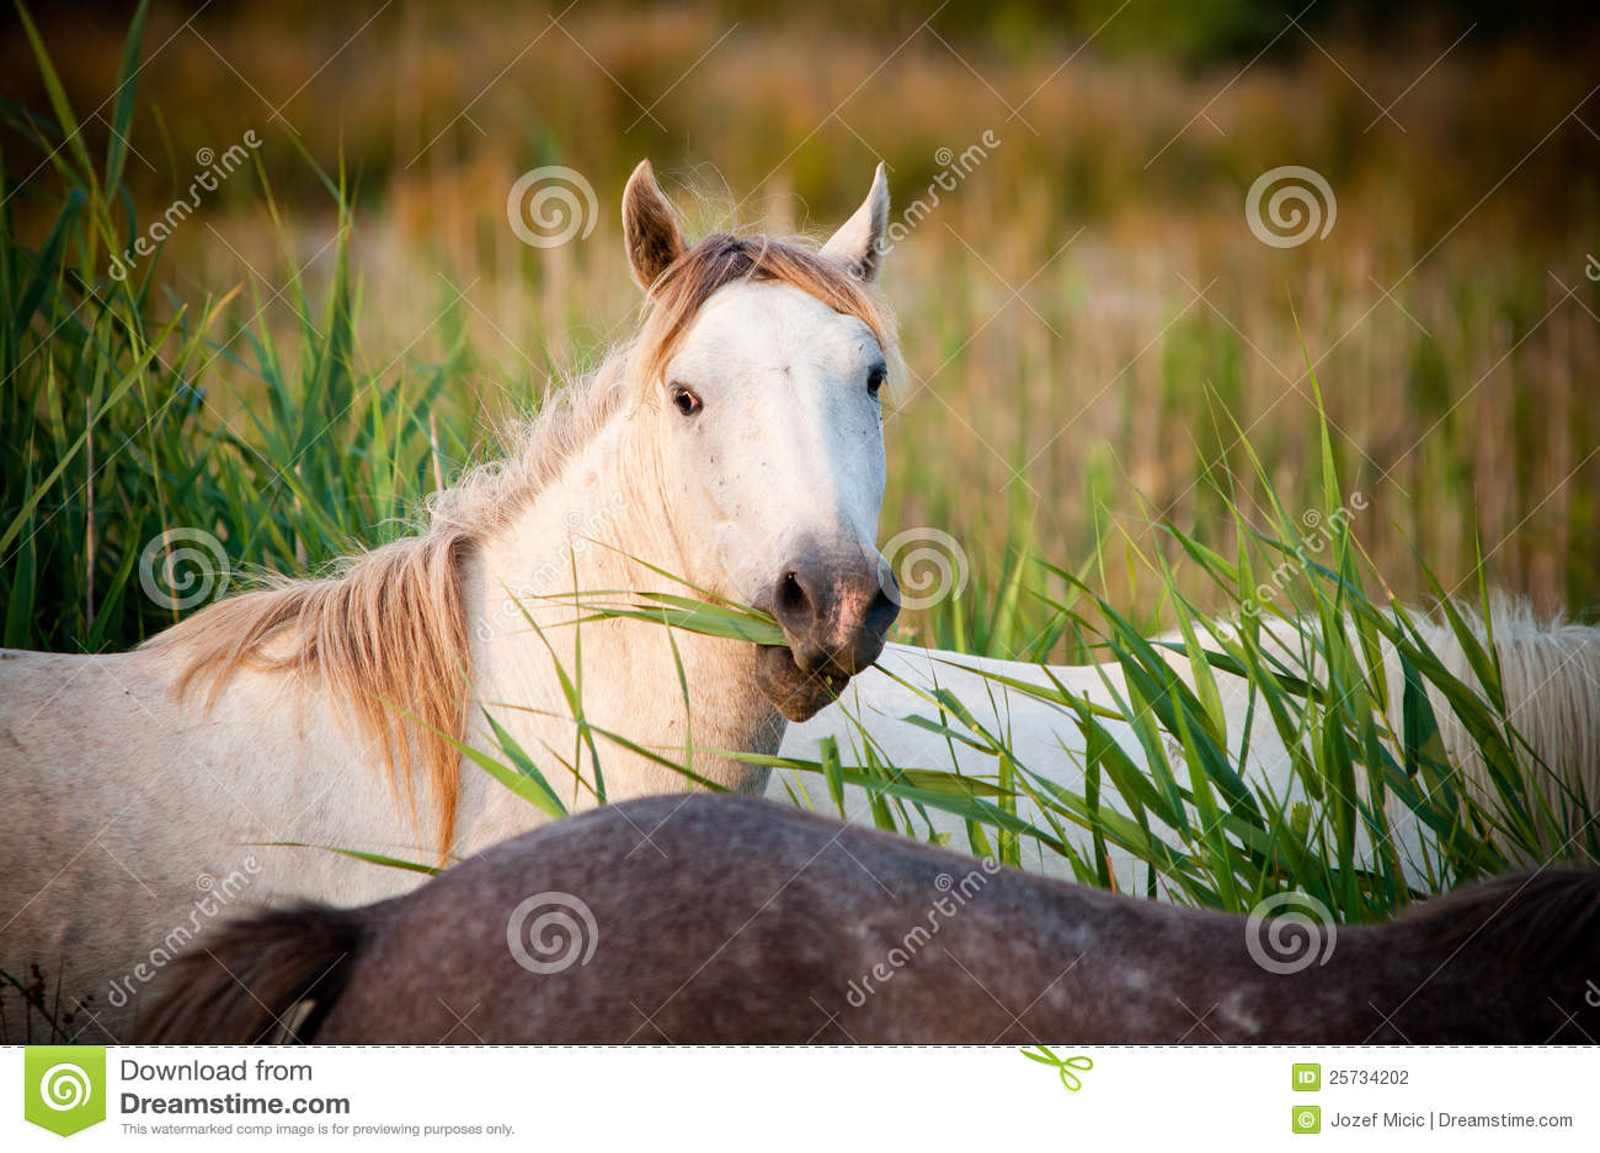 White horse eating grass - photo#9